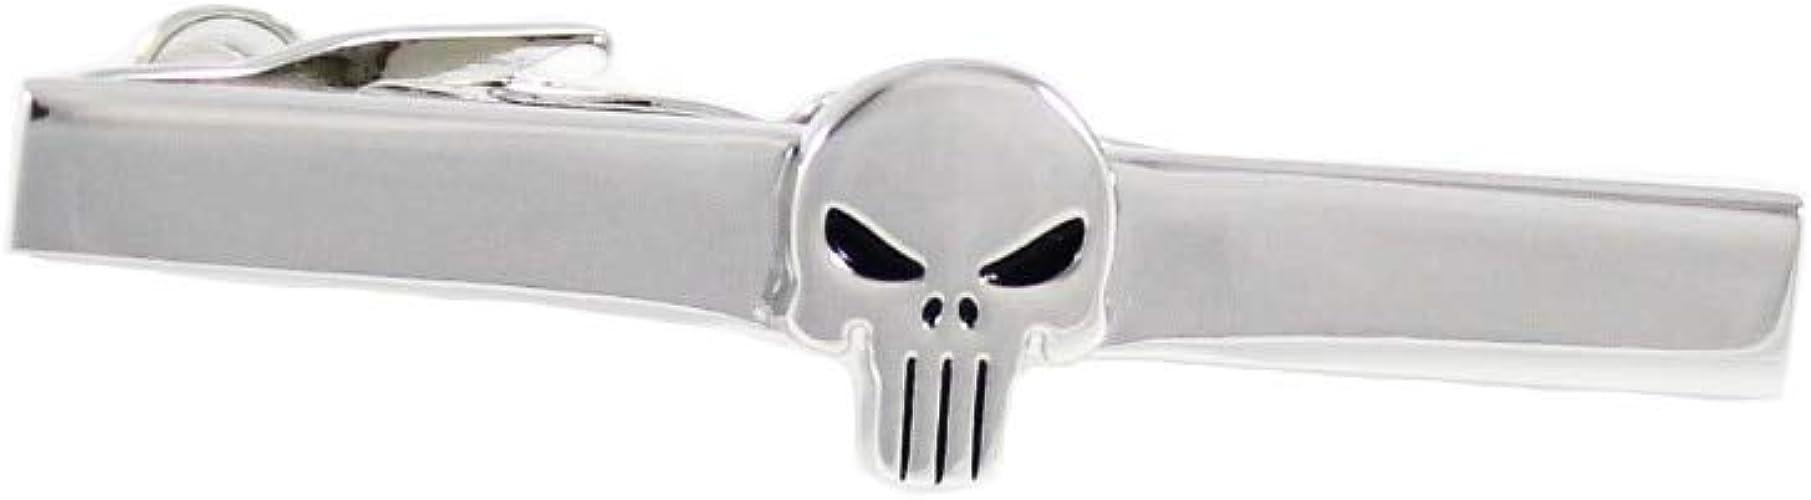 AFHT Símbolo Clip de Corbata Carácter cómico Símbolo Calavera ...